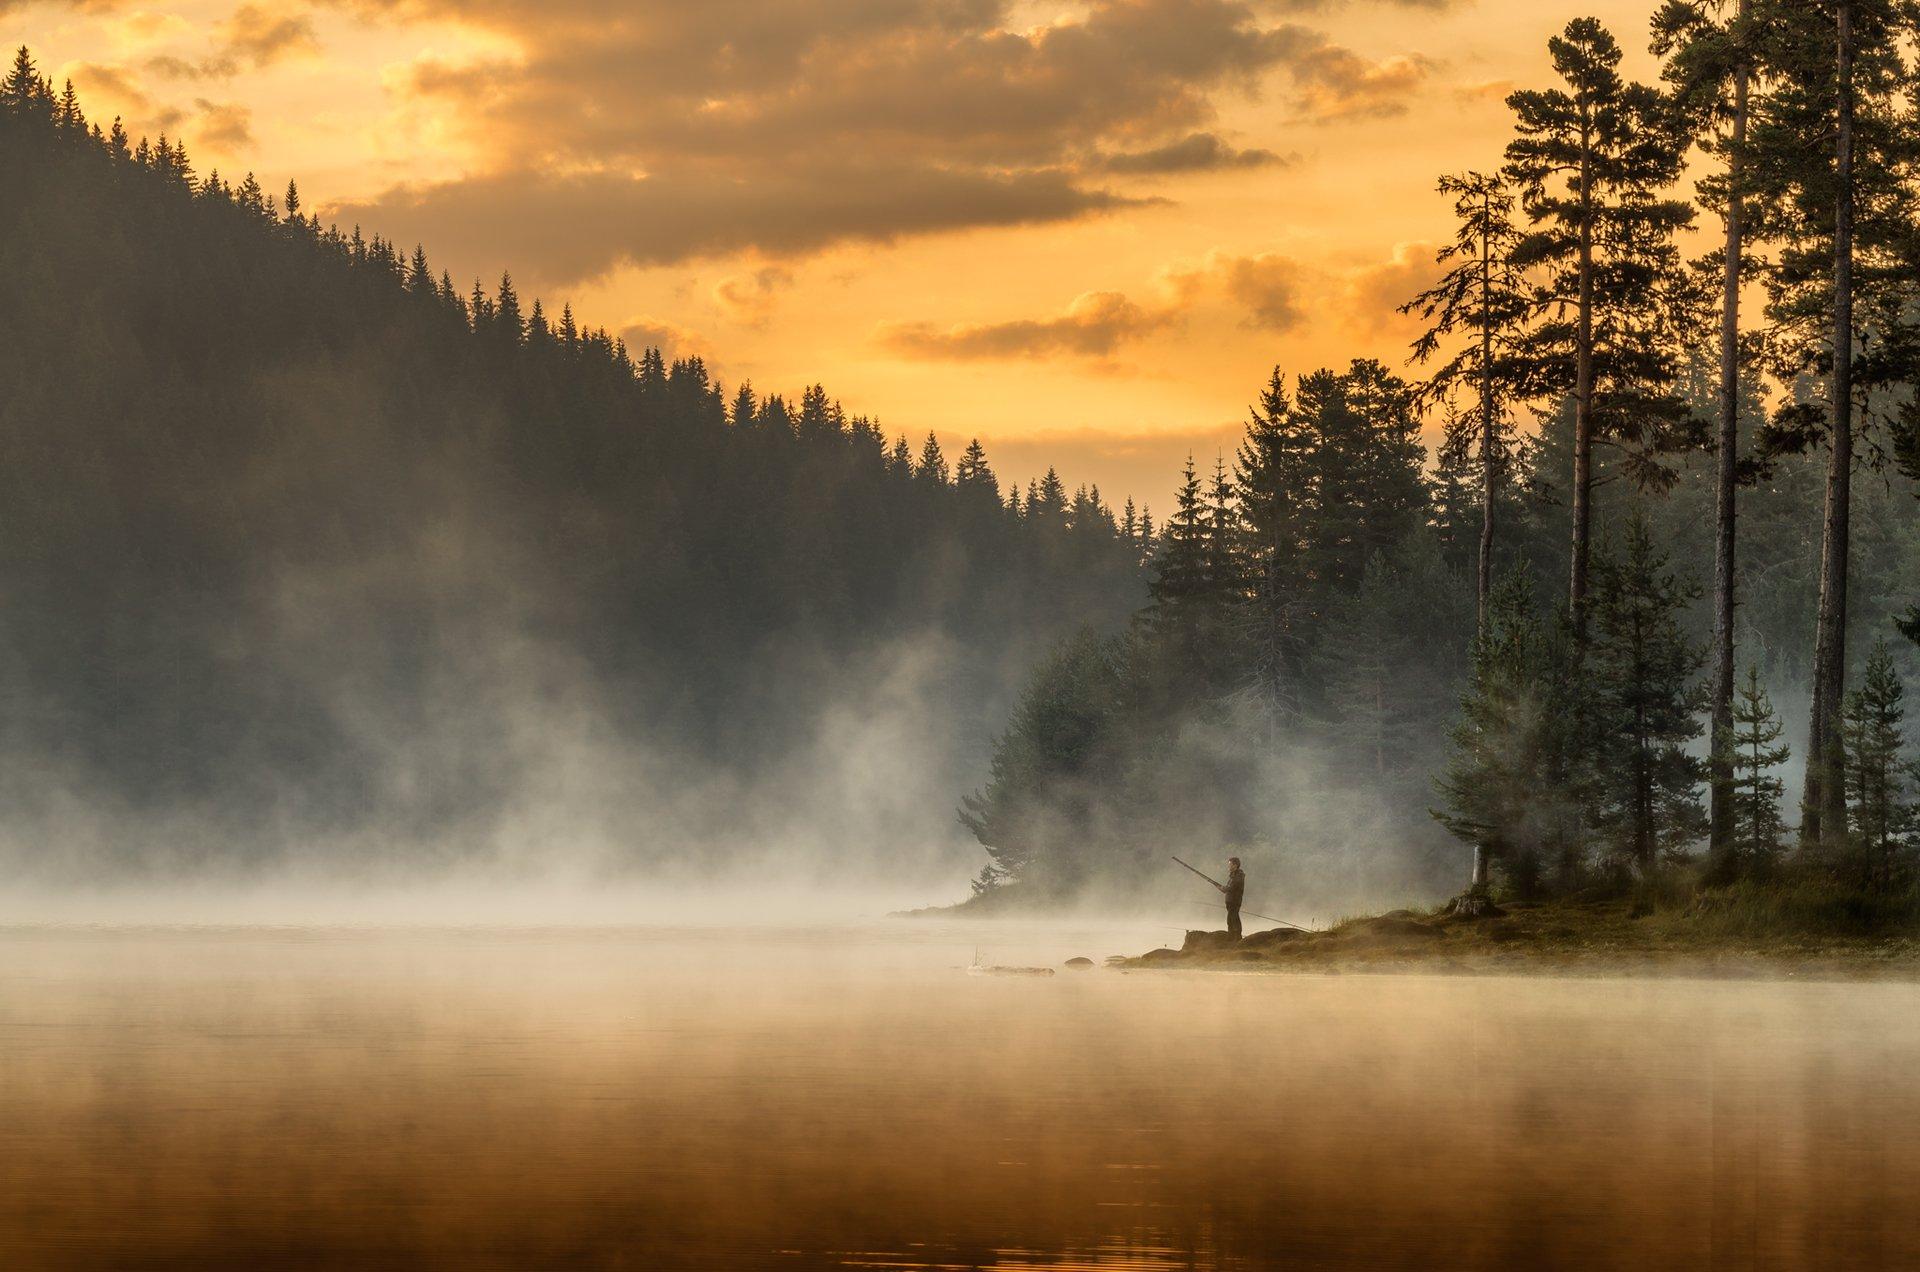 landscape, nature, sunrise, morning, dawn, утро, пейзаж, озеро, coastal, coast, beach, lake, long, exposure, scenery, fog, foggy, mist, fishing, Александър Александров